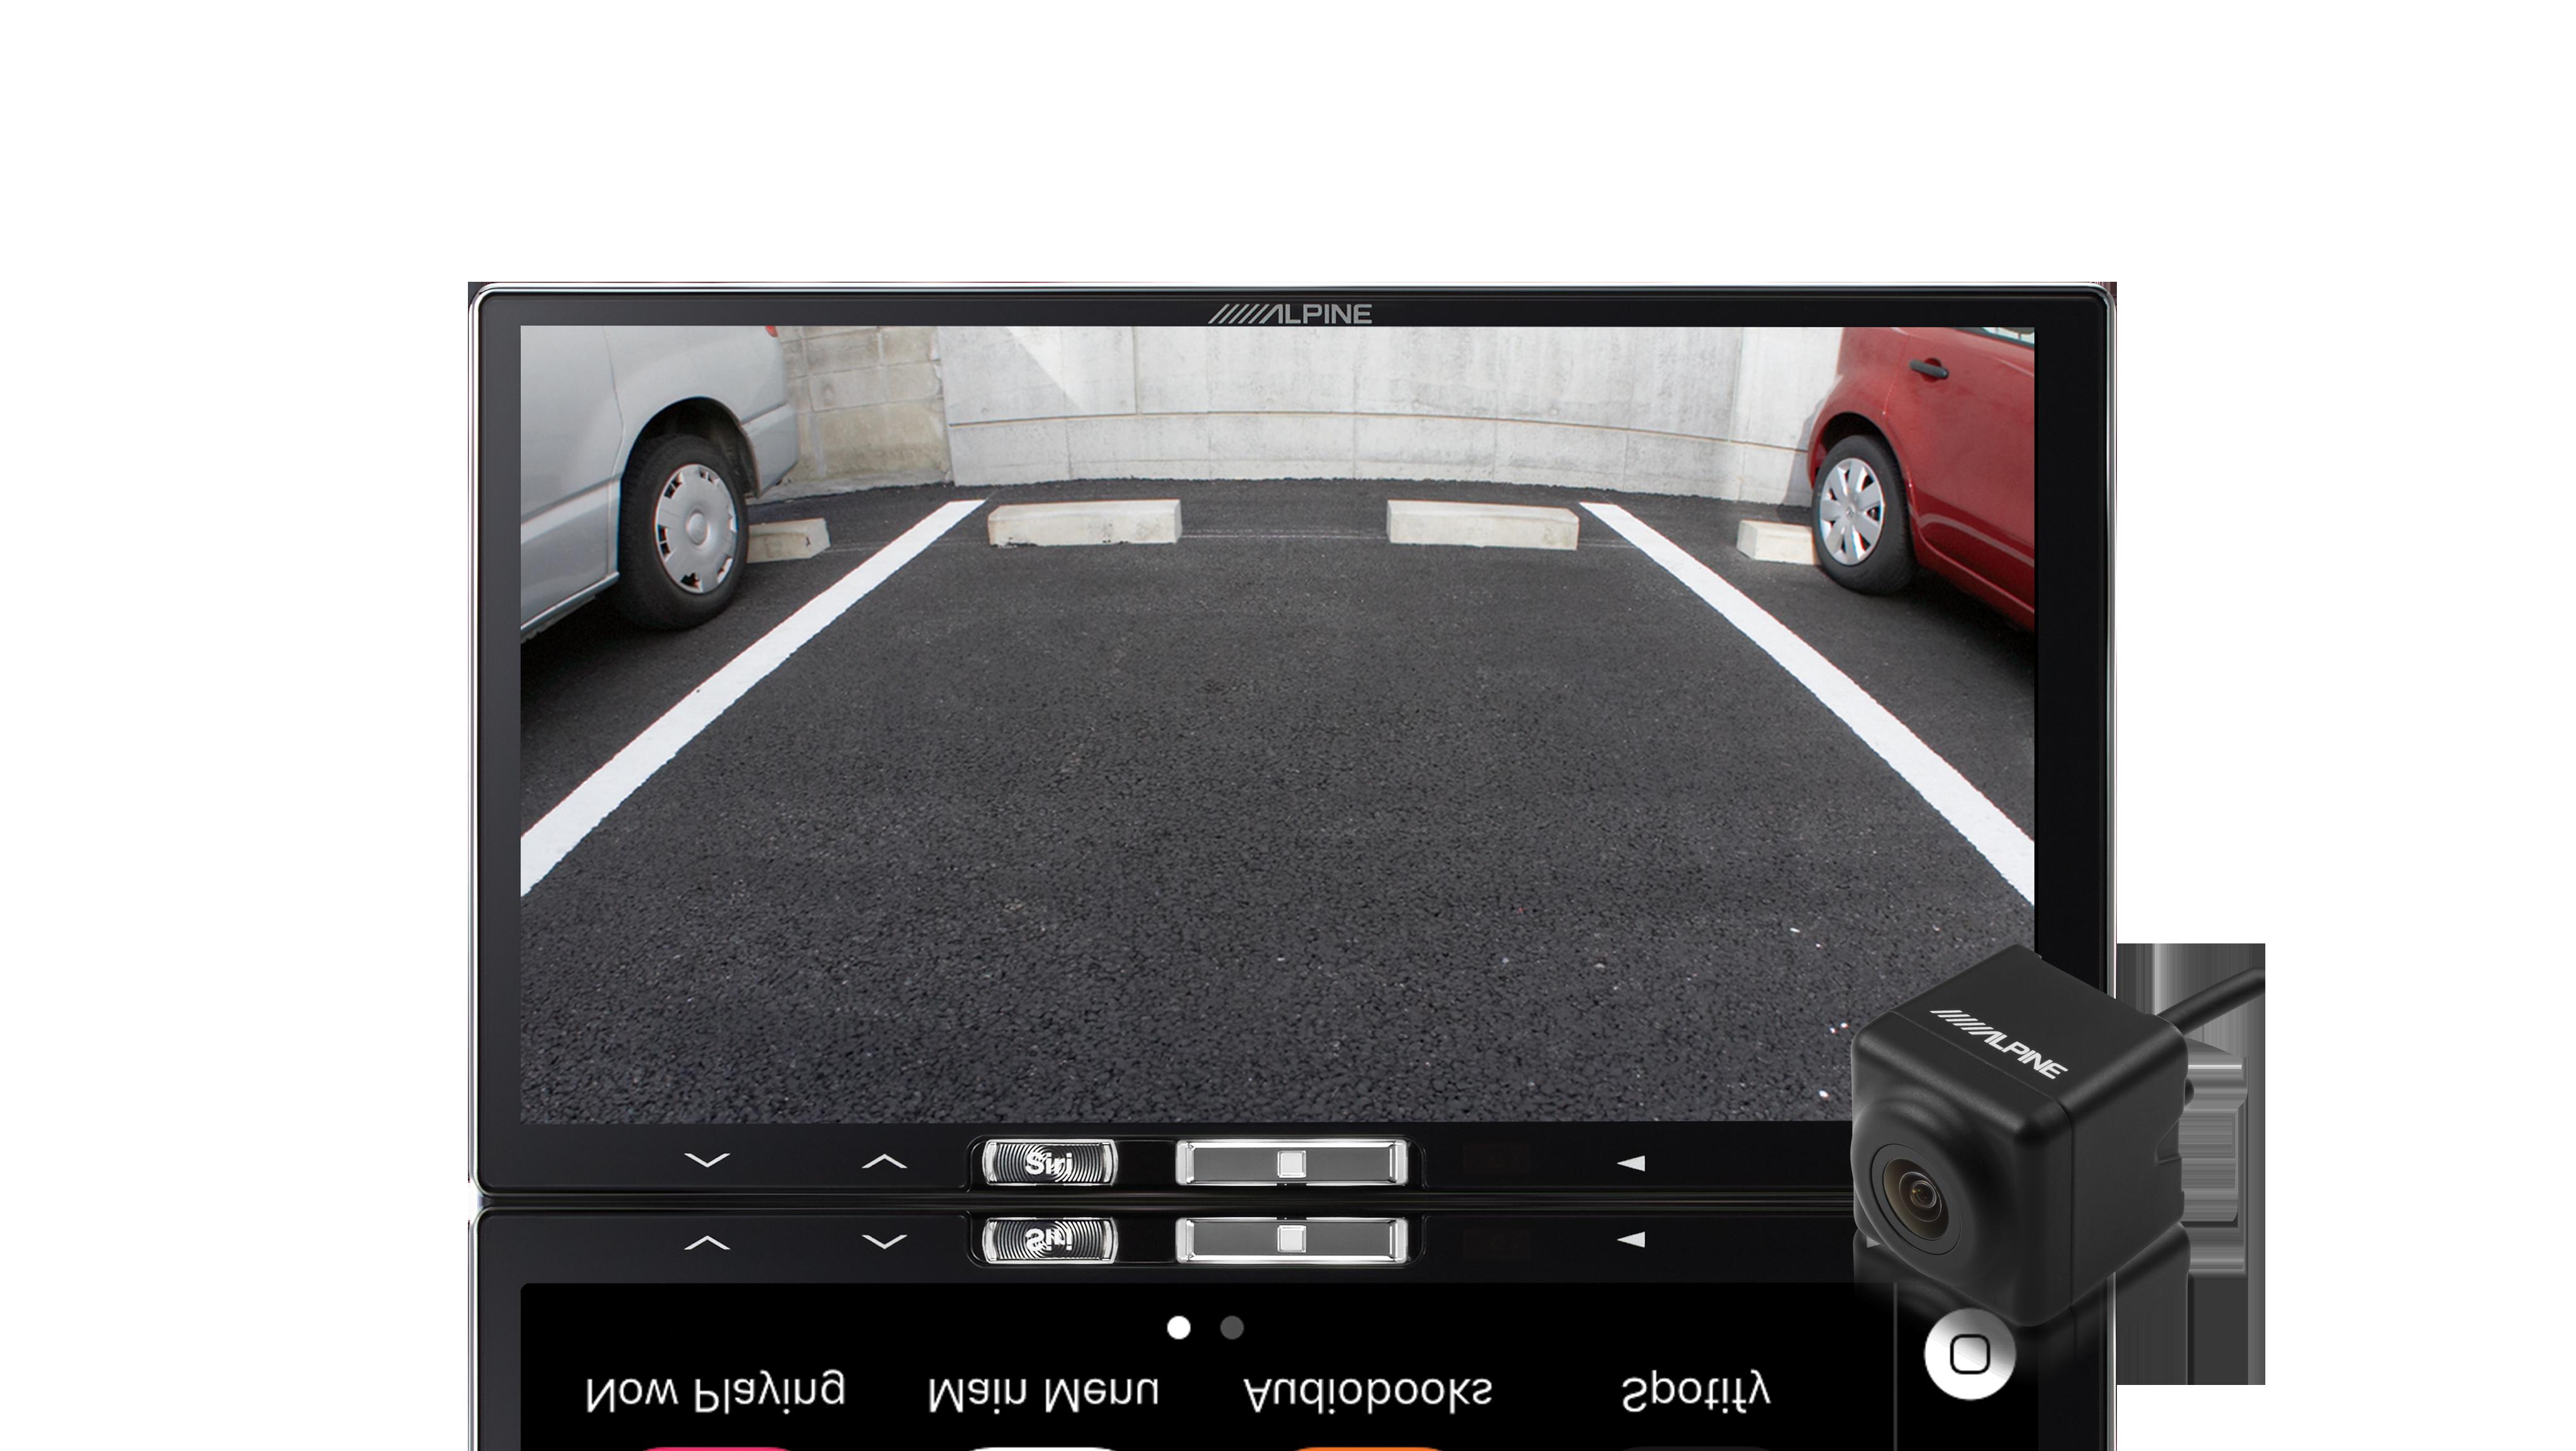 iLX-107 rear view camera